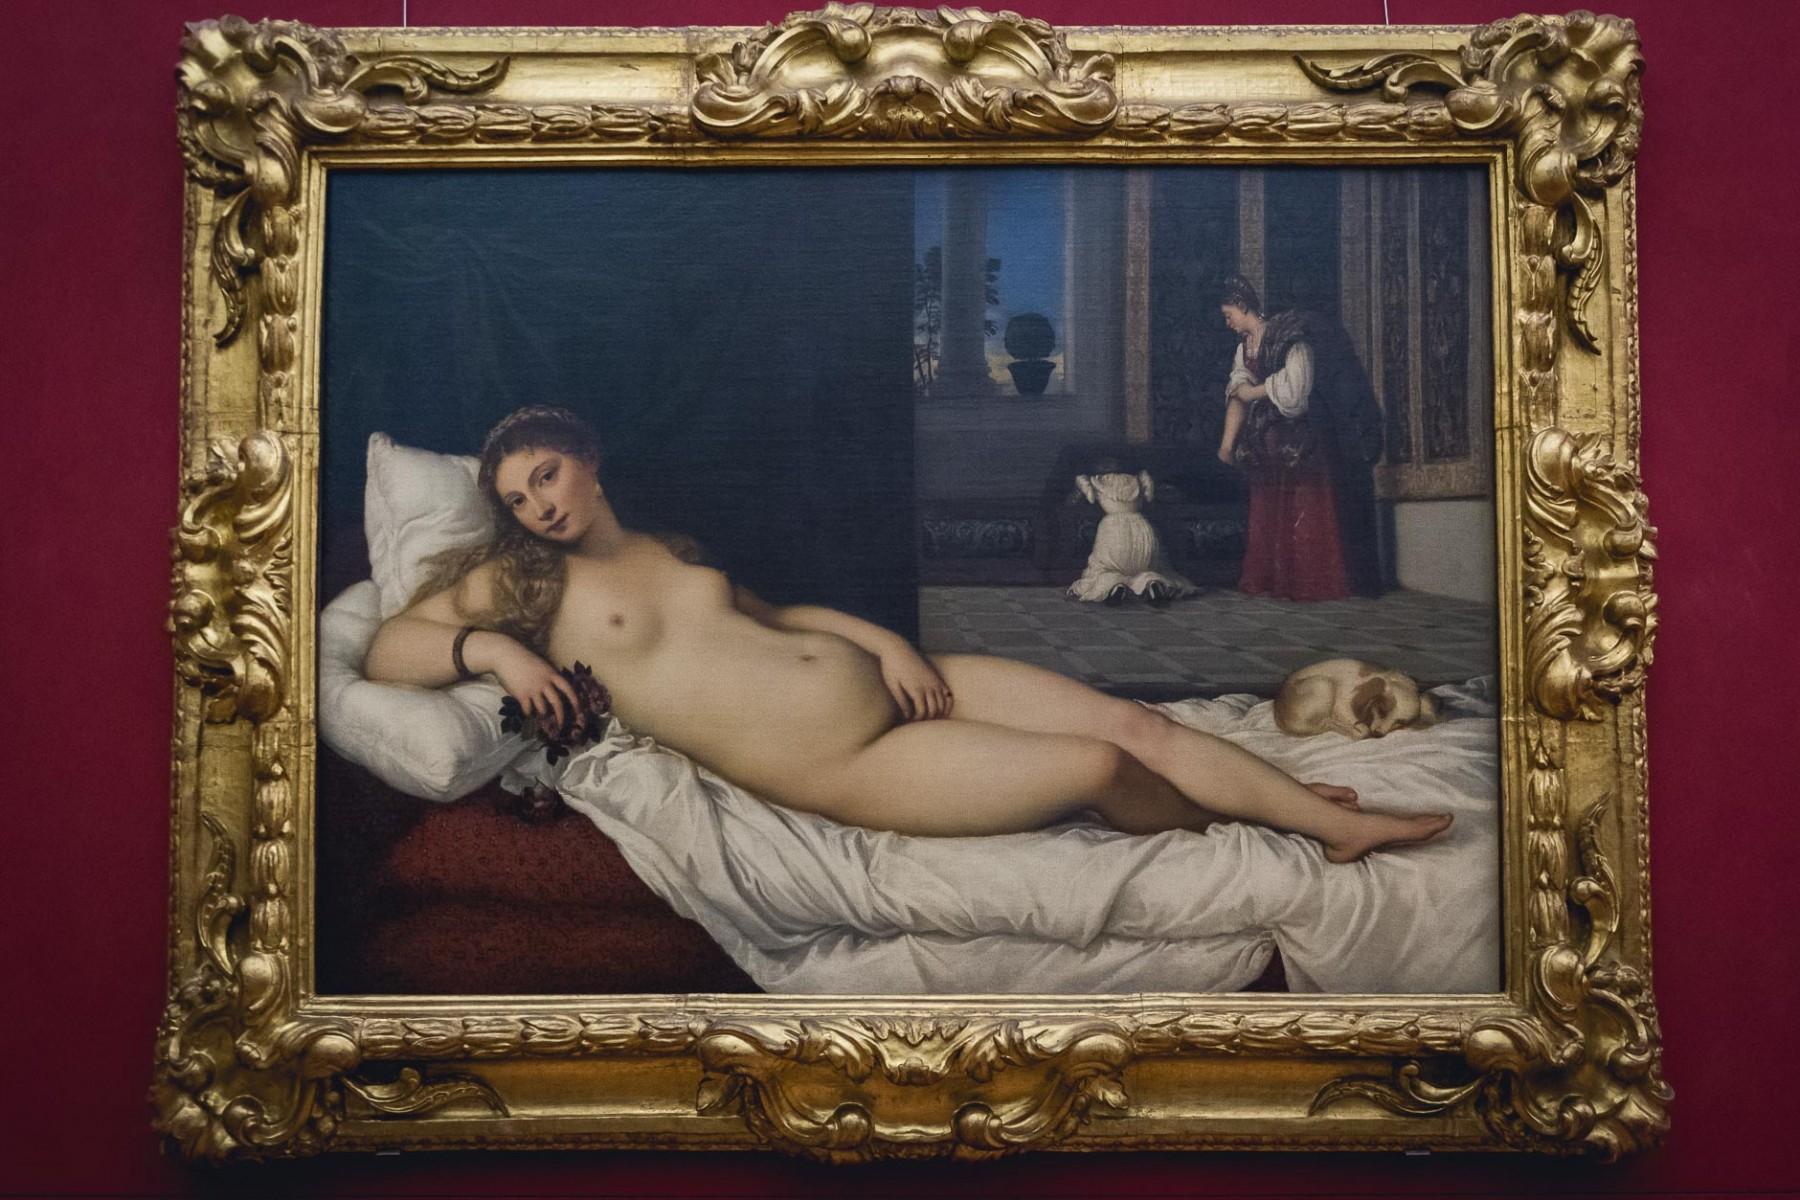 Titian's Venus of Urbino, Florence, Italy